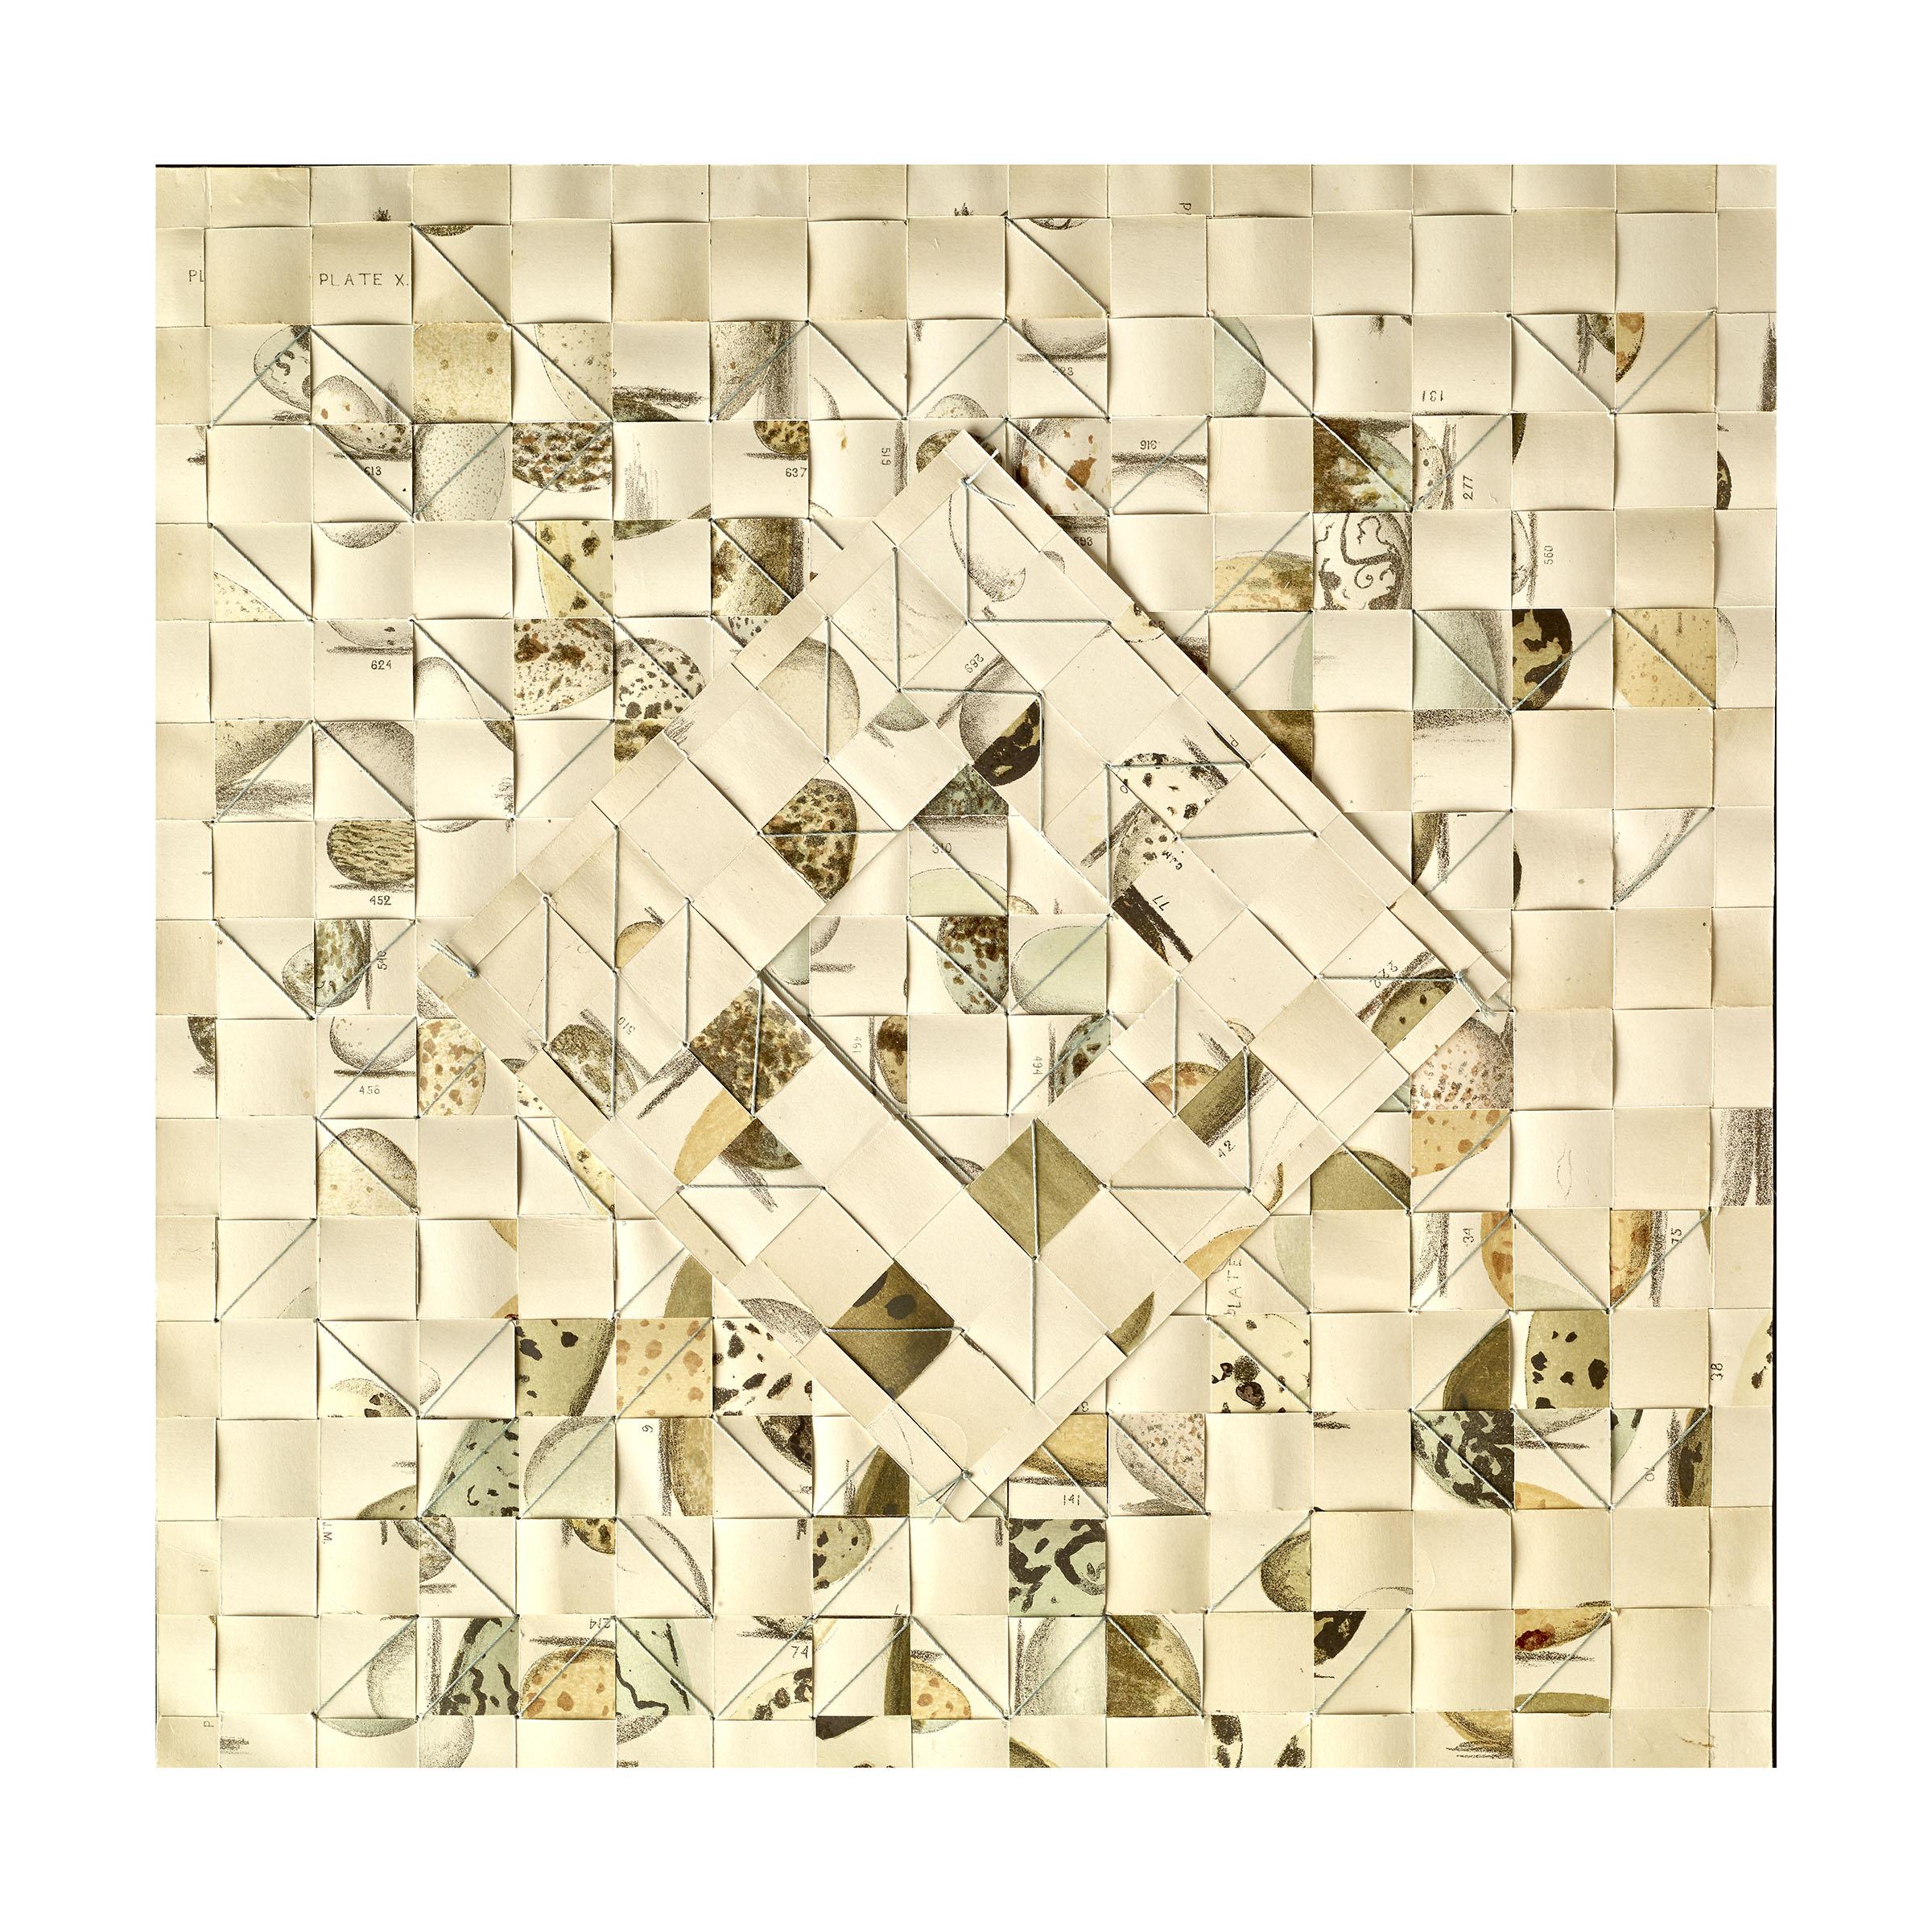 Kunstadt_ OVUM VII_Breakthrough_ silk thread, paper_ bookplates1890_12.325 x 12.325 in.